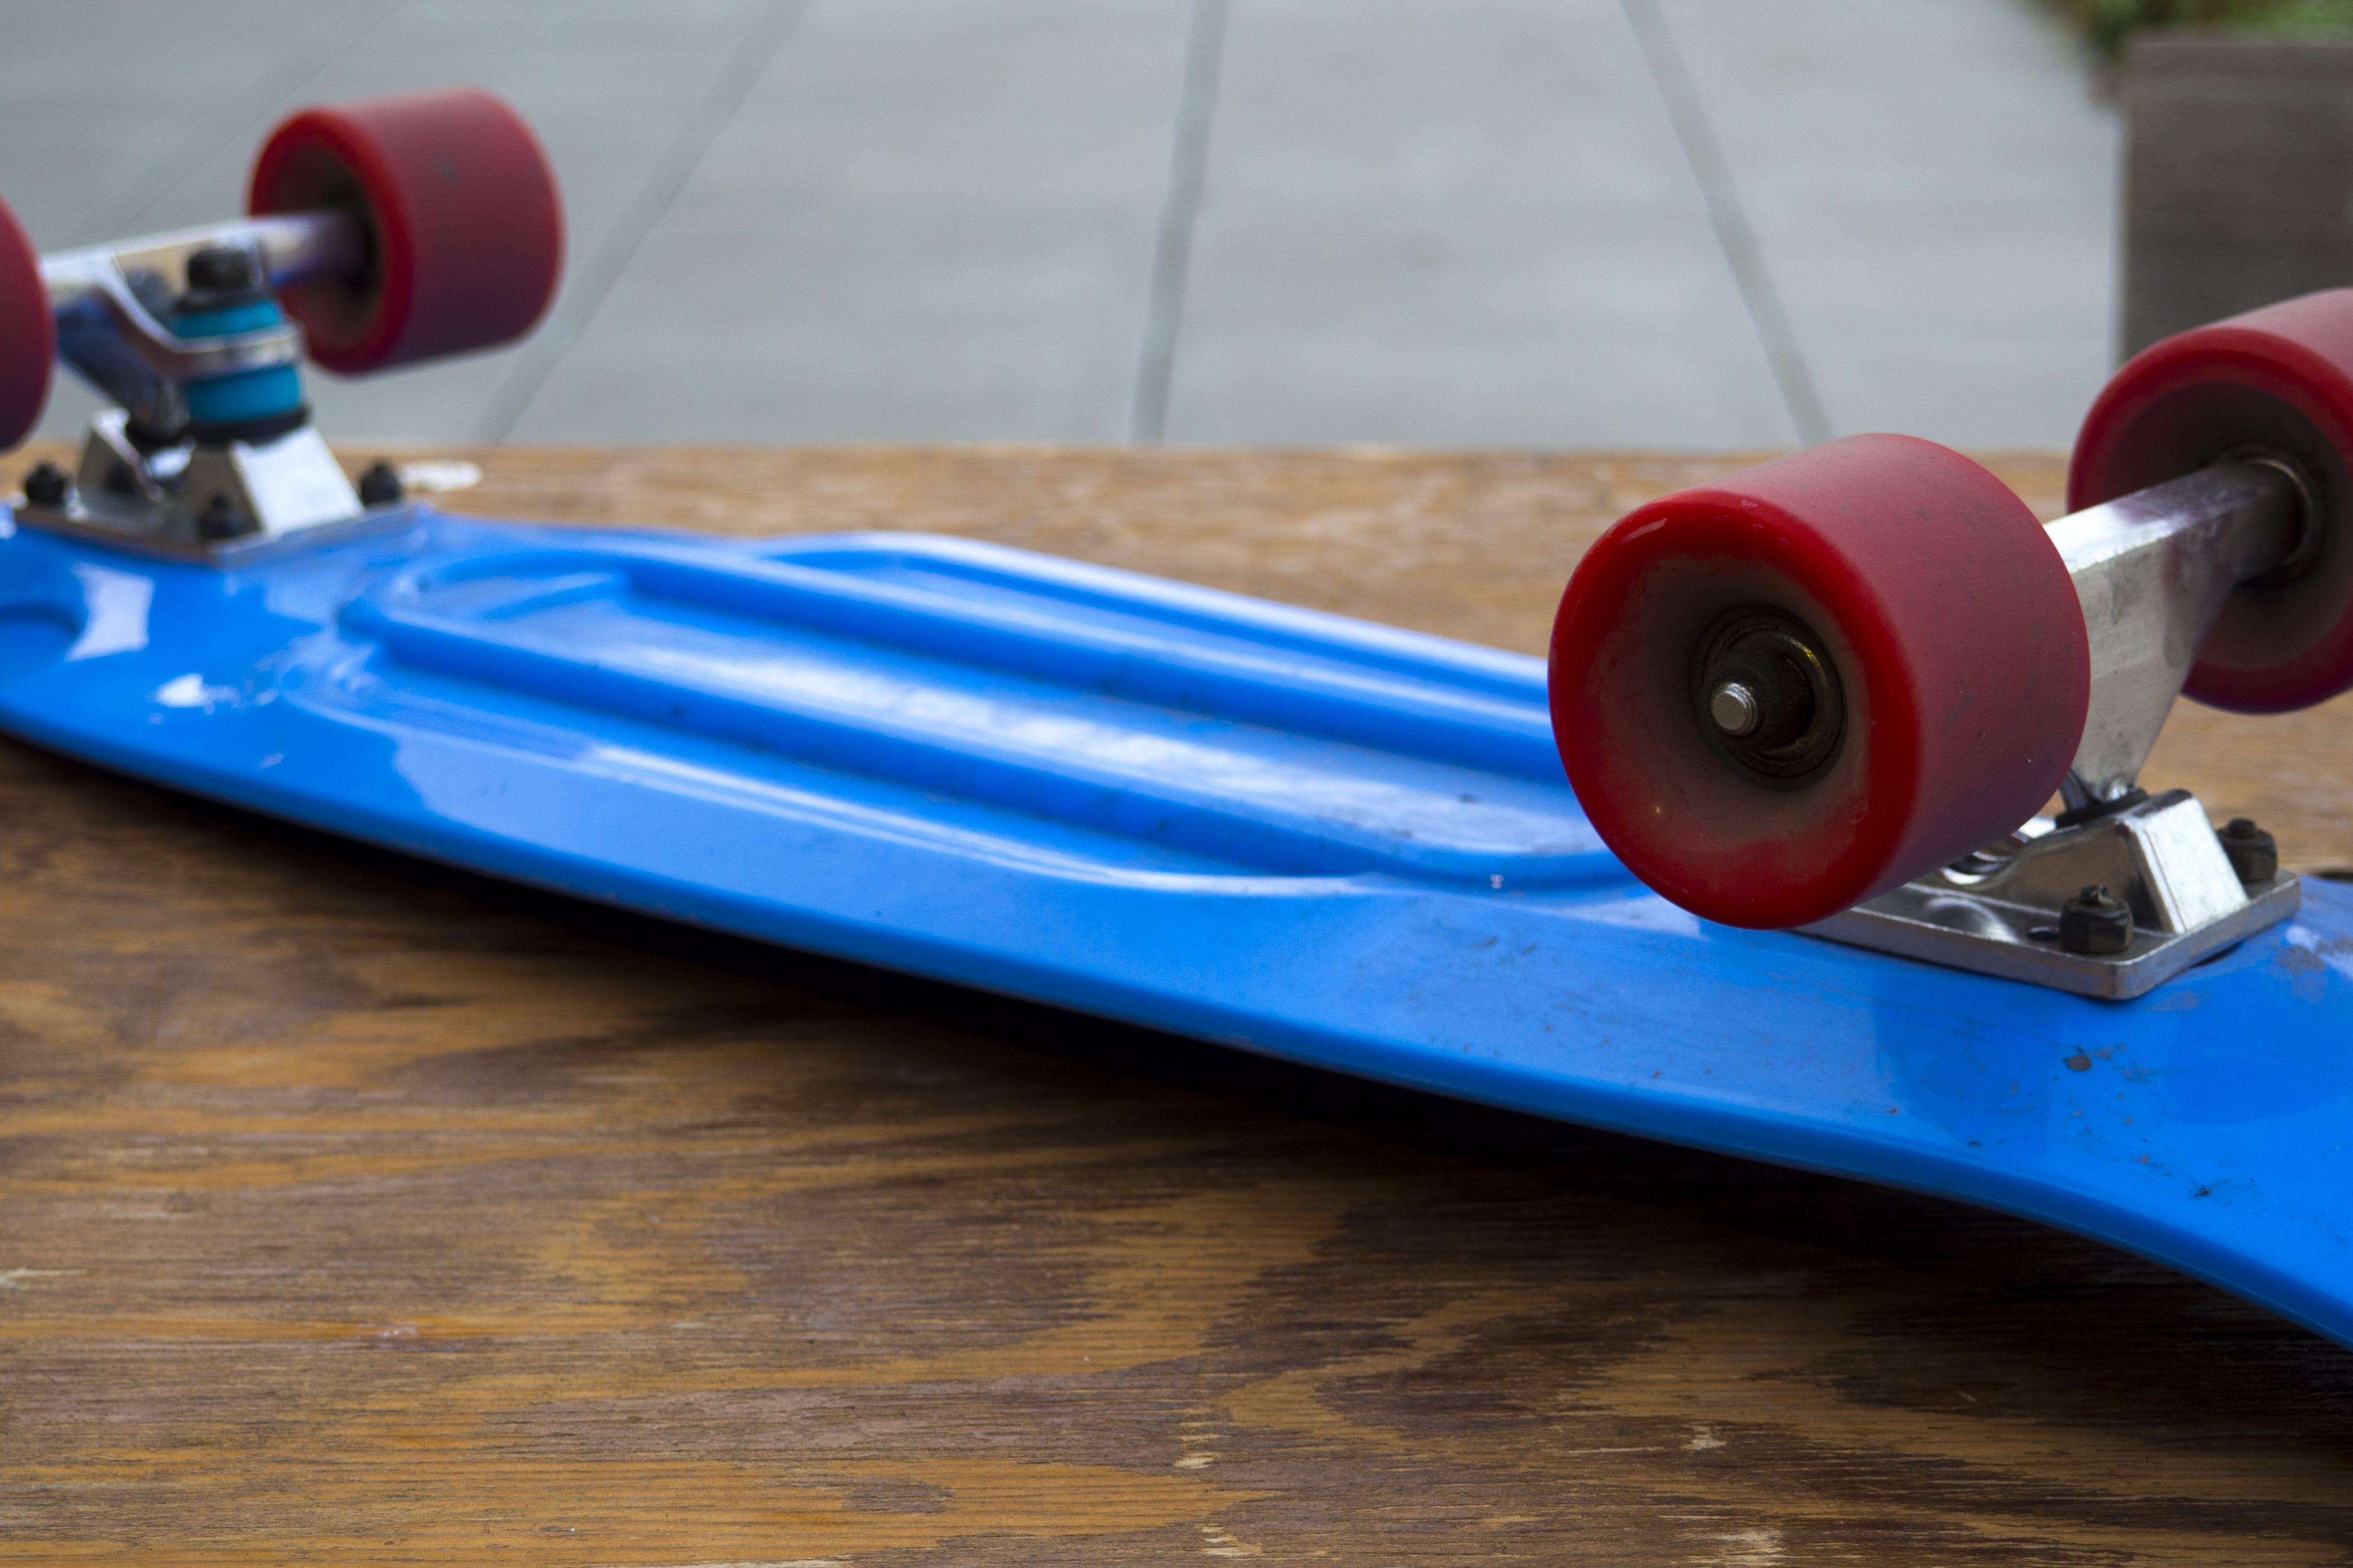 Free stock photo of blue, board, longboard, red